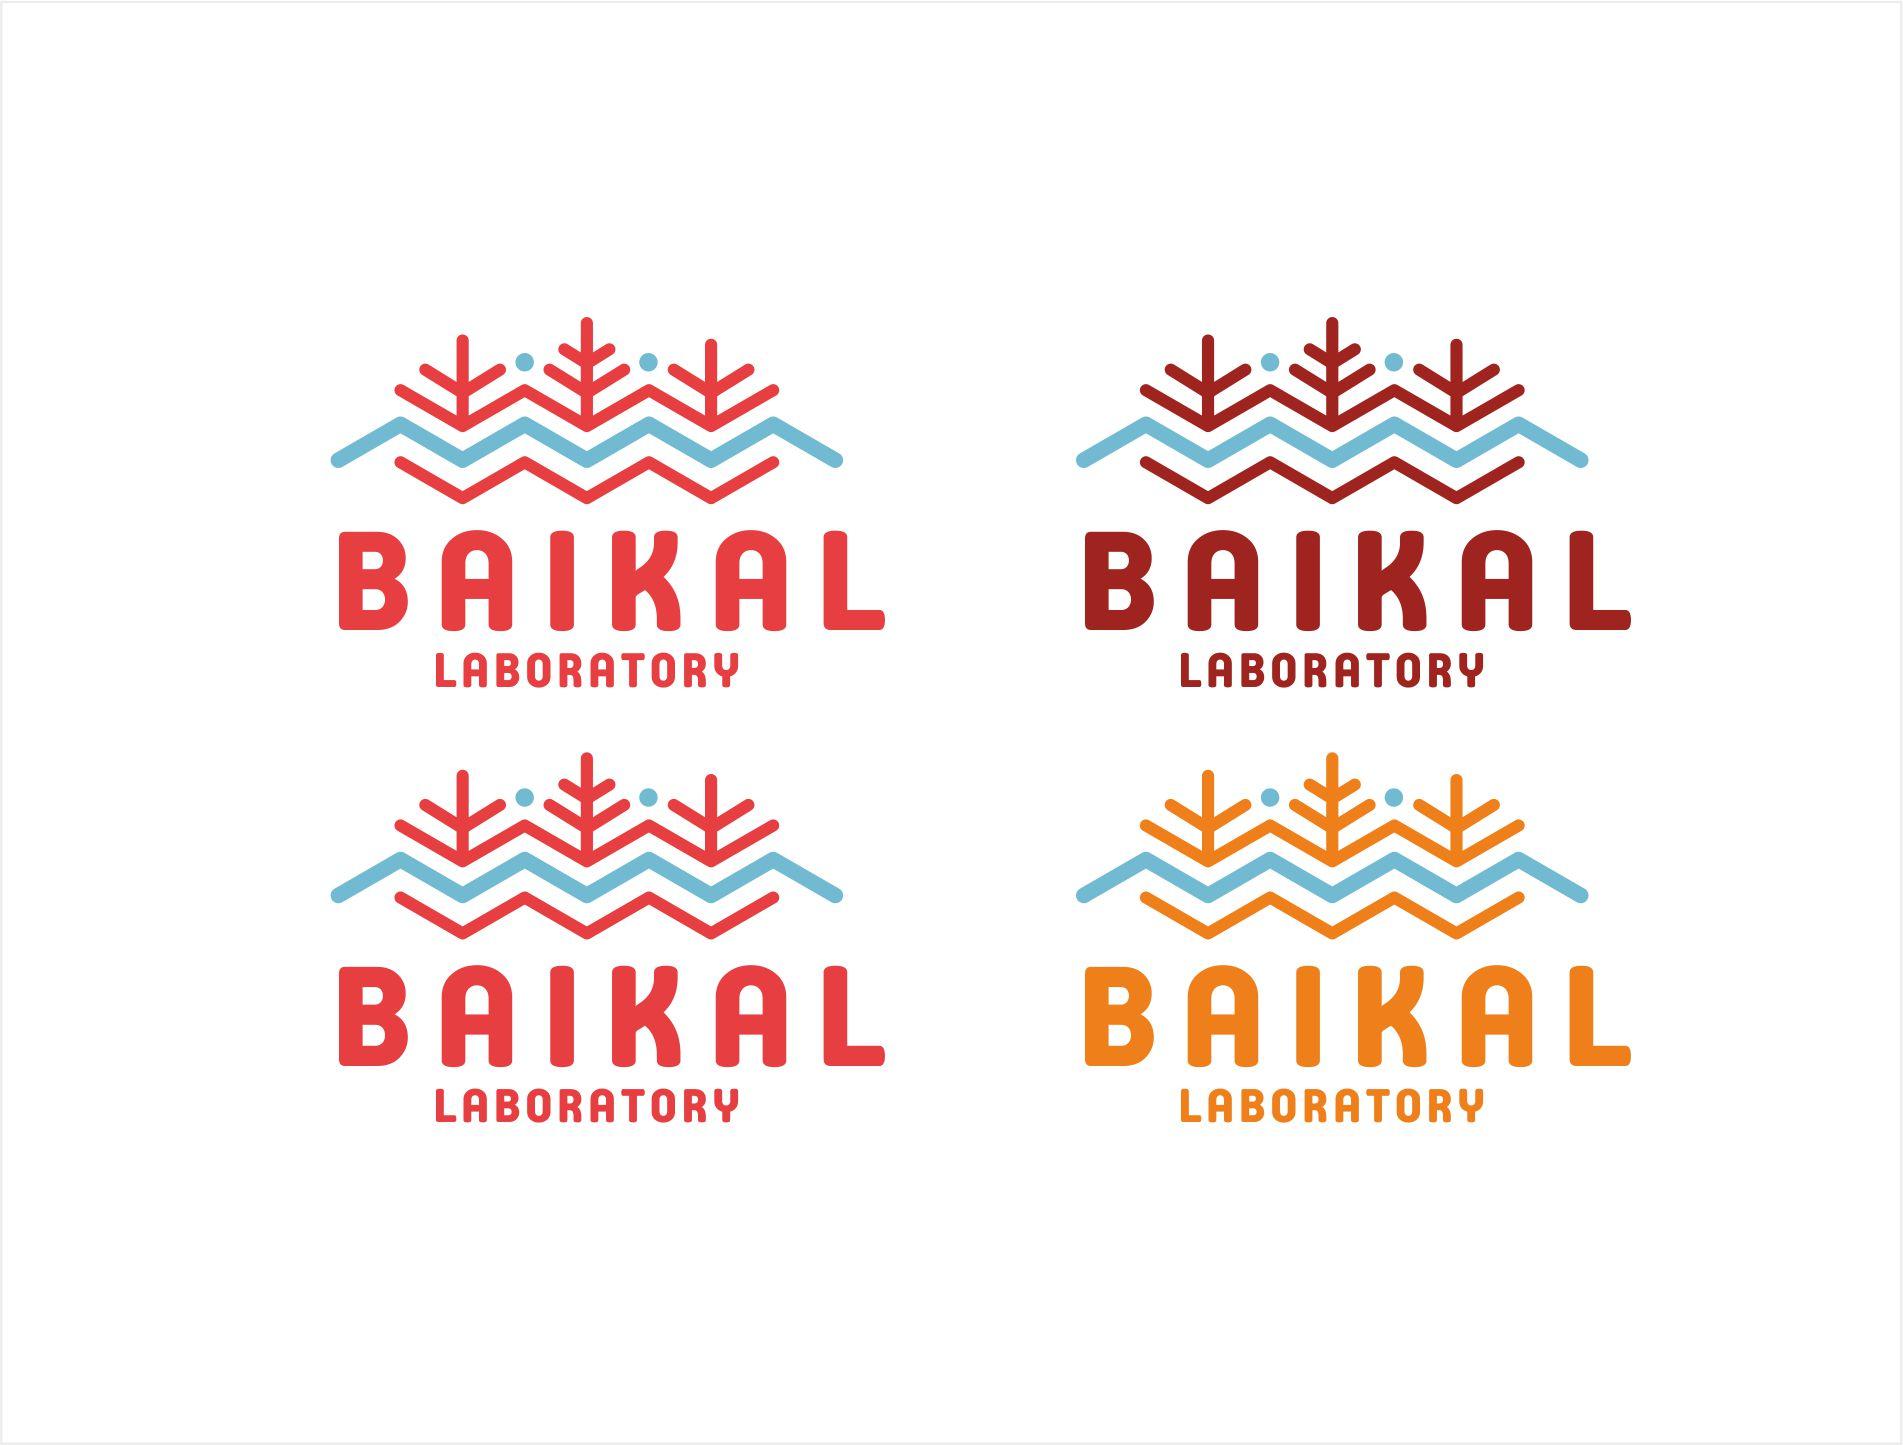 Разработка логотипа торговой марки фото f_41159709ebf9729d.jpg